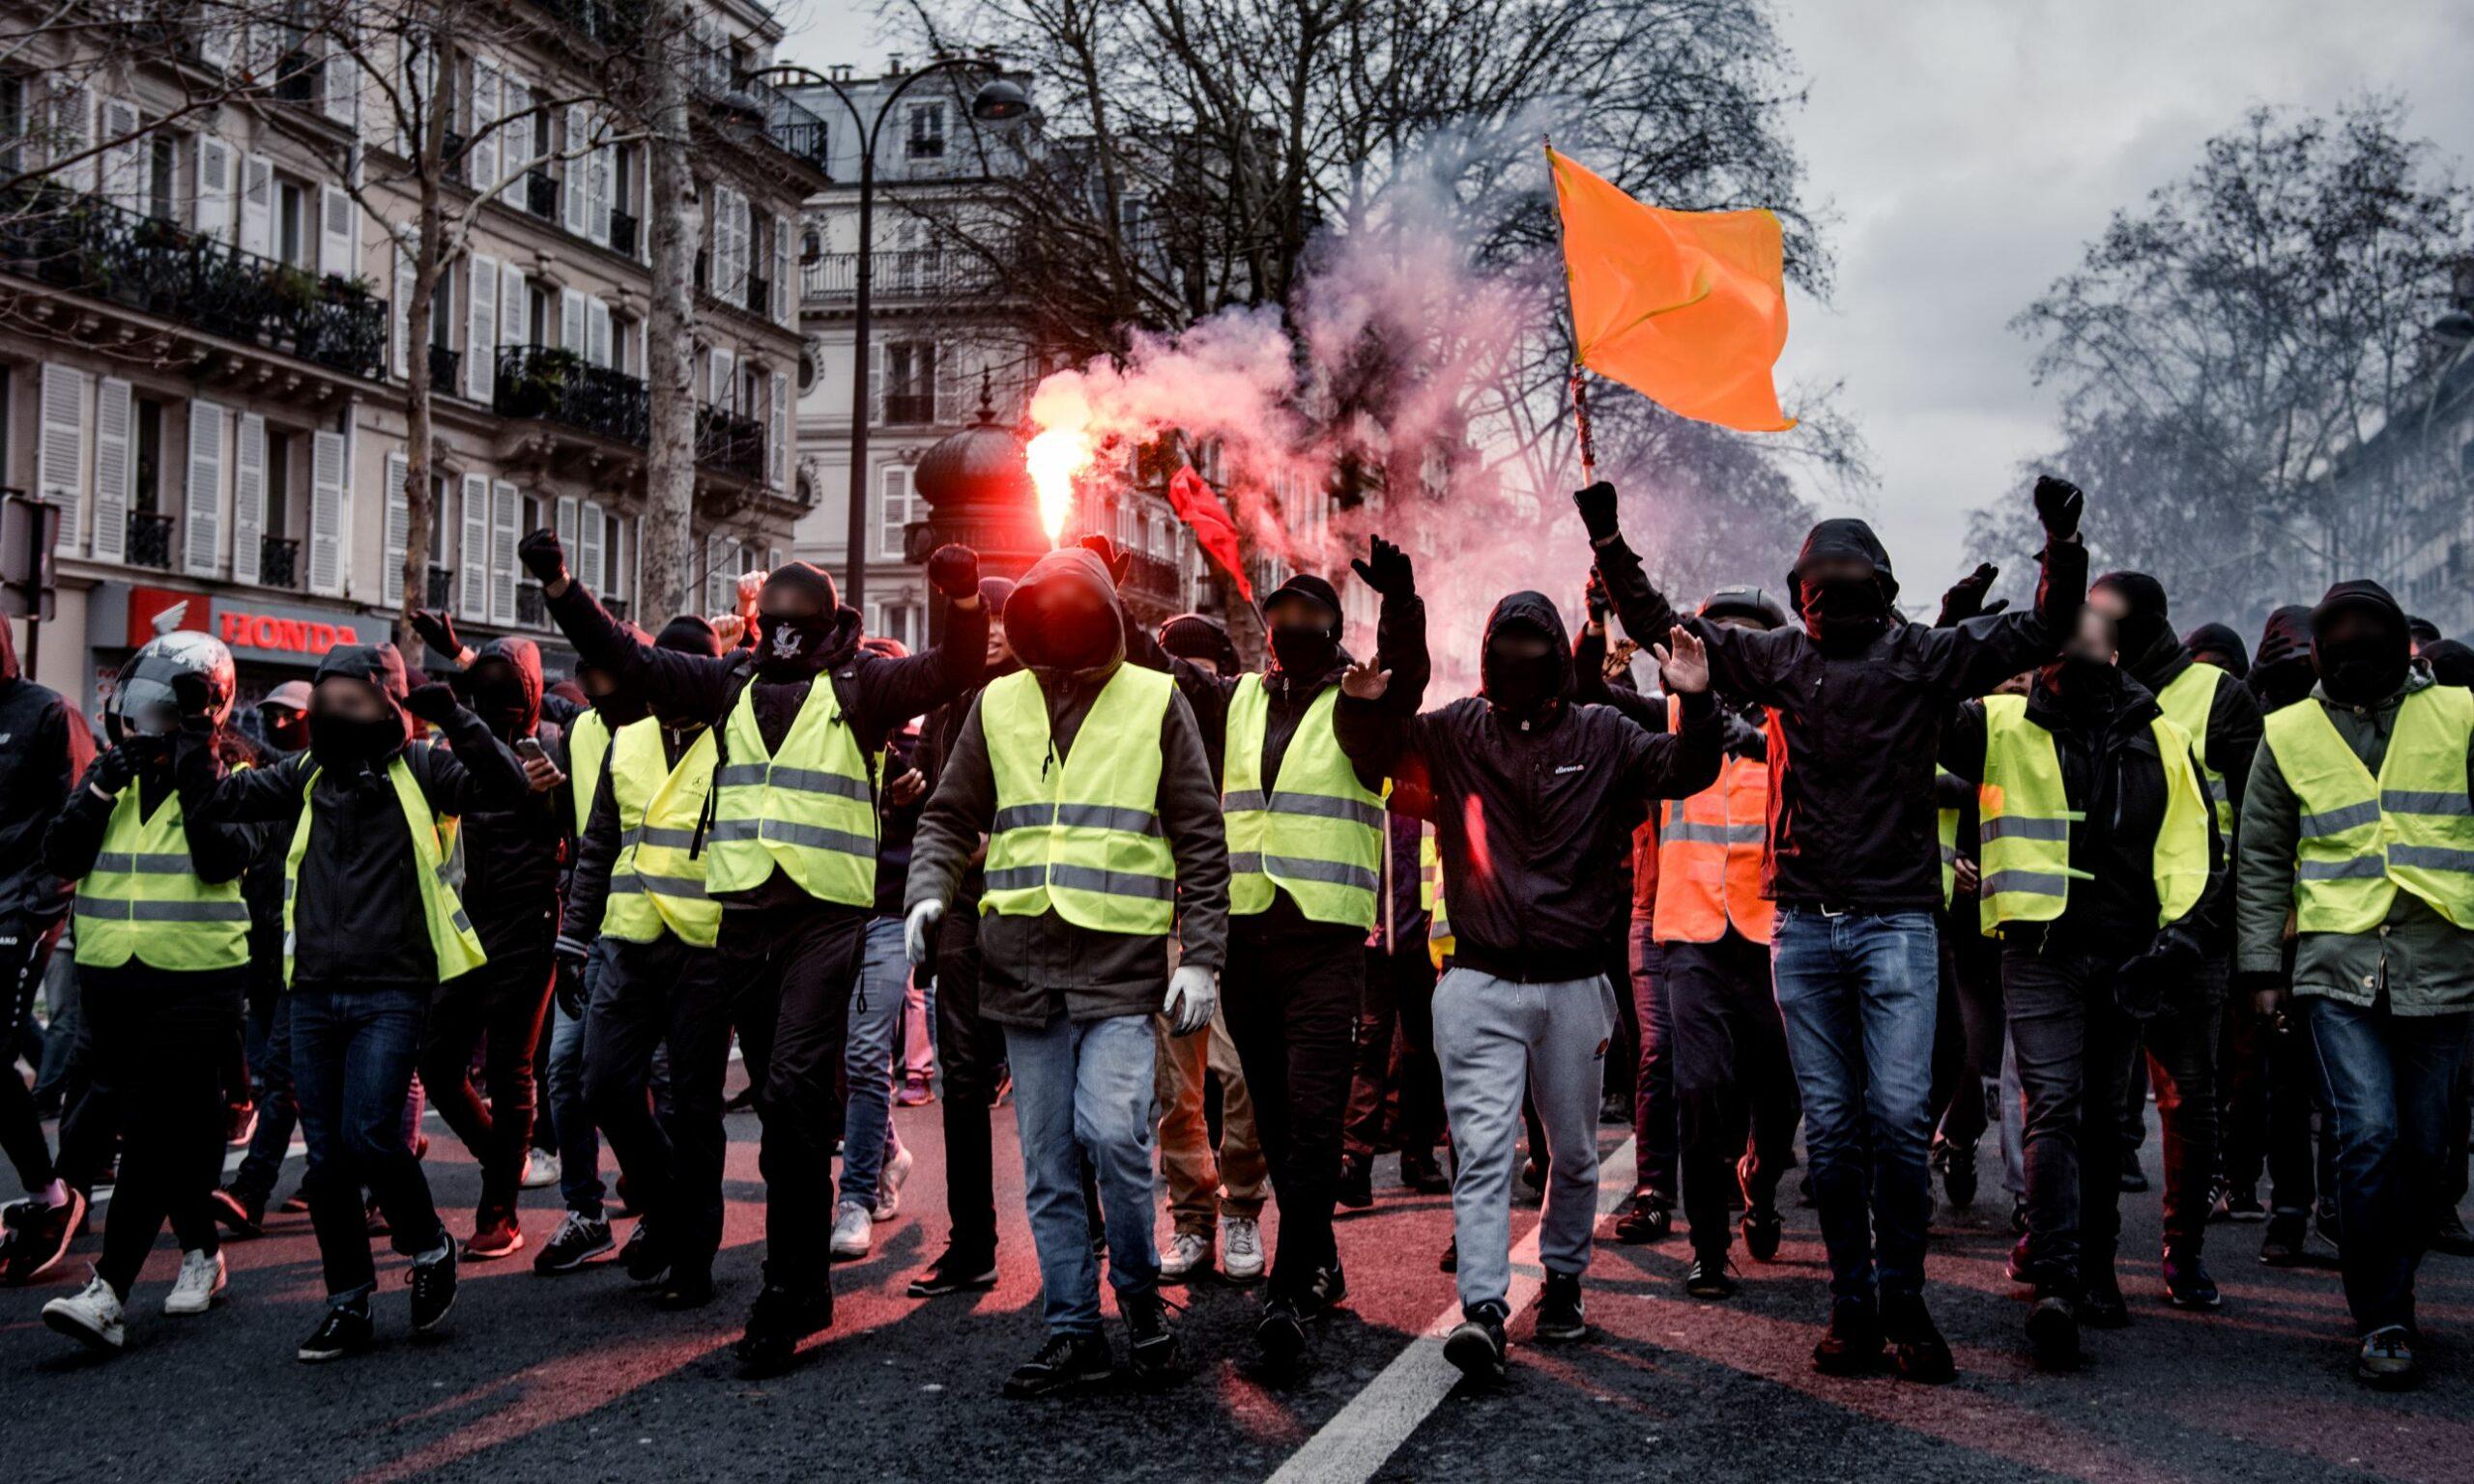 Manif Antifasciste Gilets Jaunes